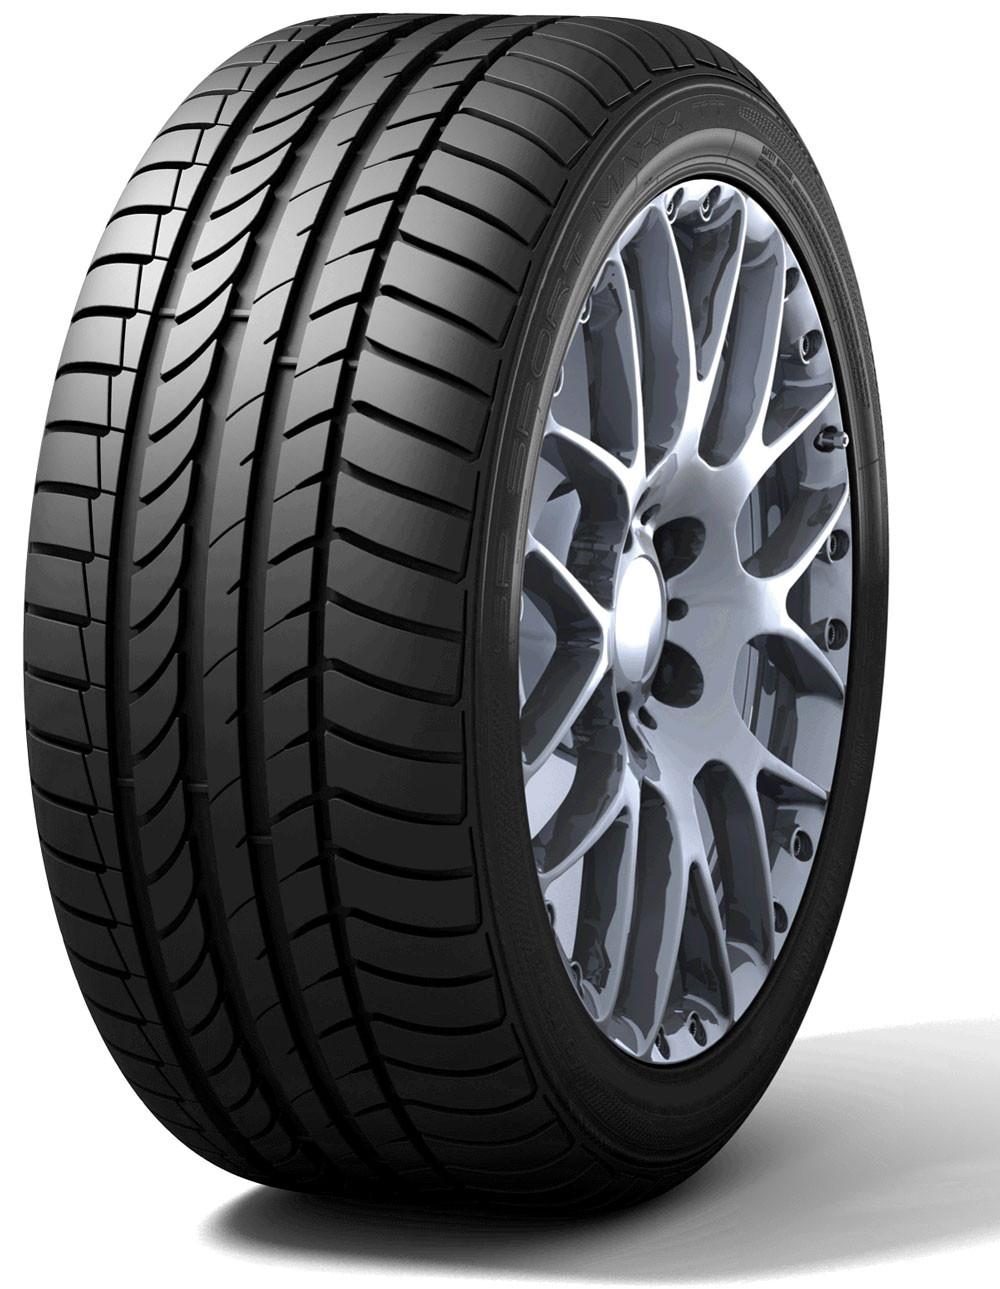 Dunlop SP Sport Maxx TT R18 255/45 99Y